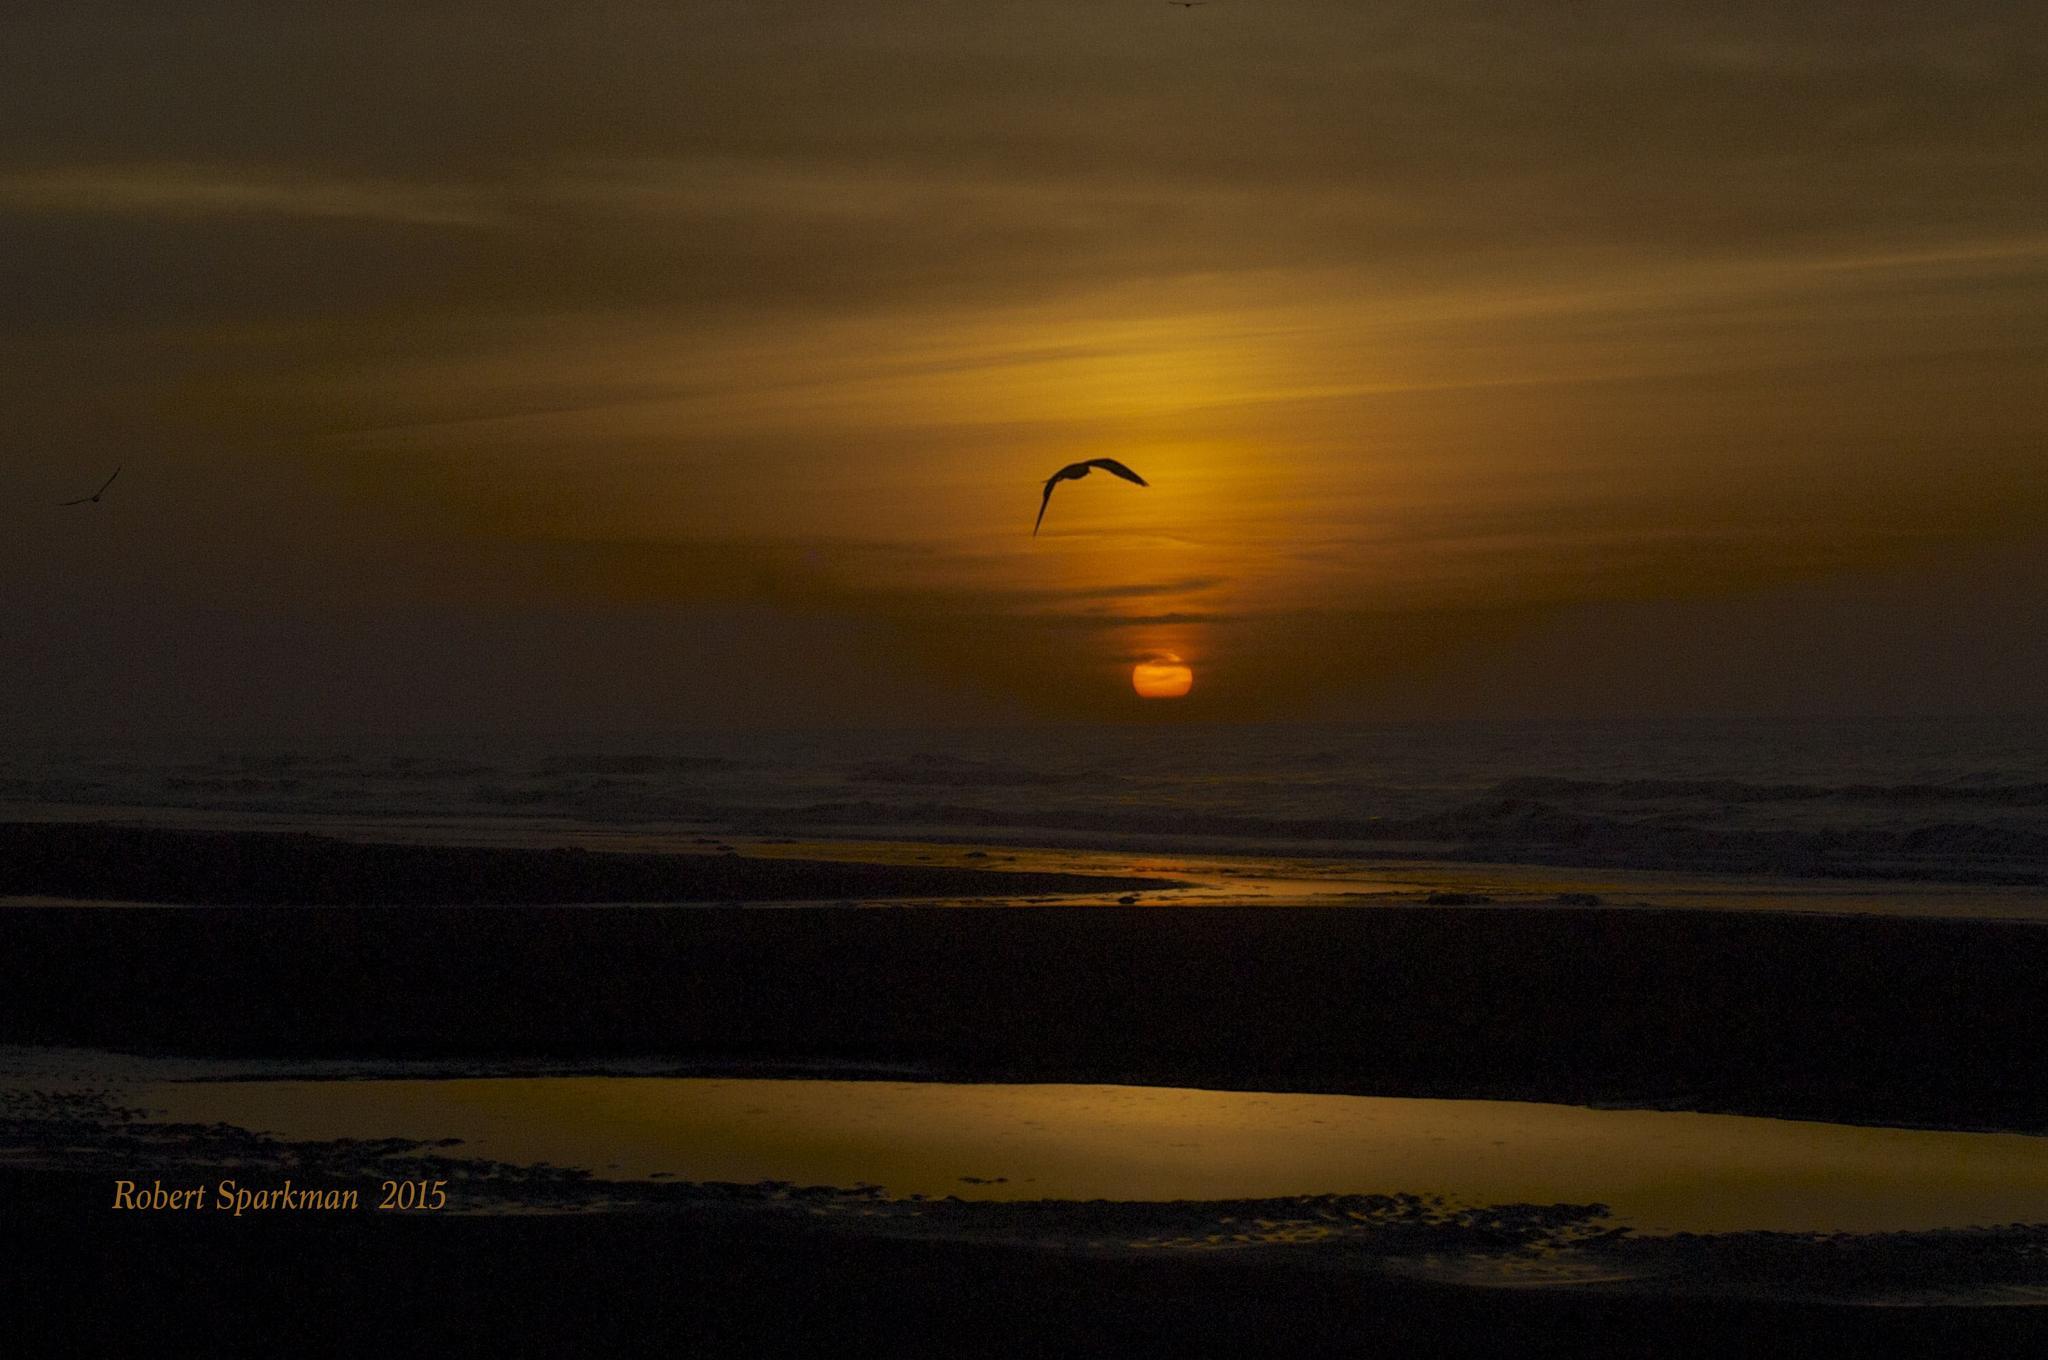 Some Bird by robert.sparkman